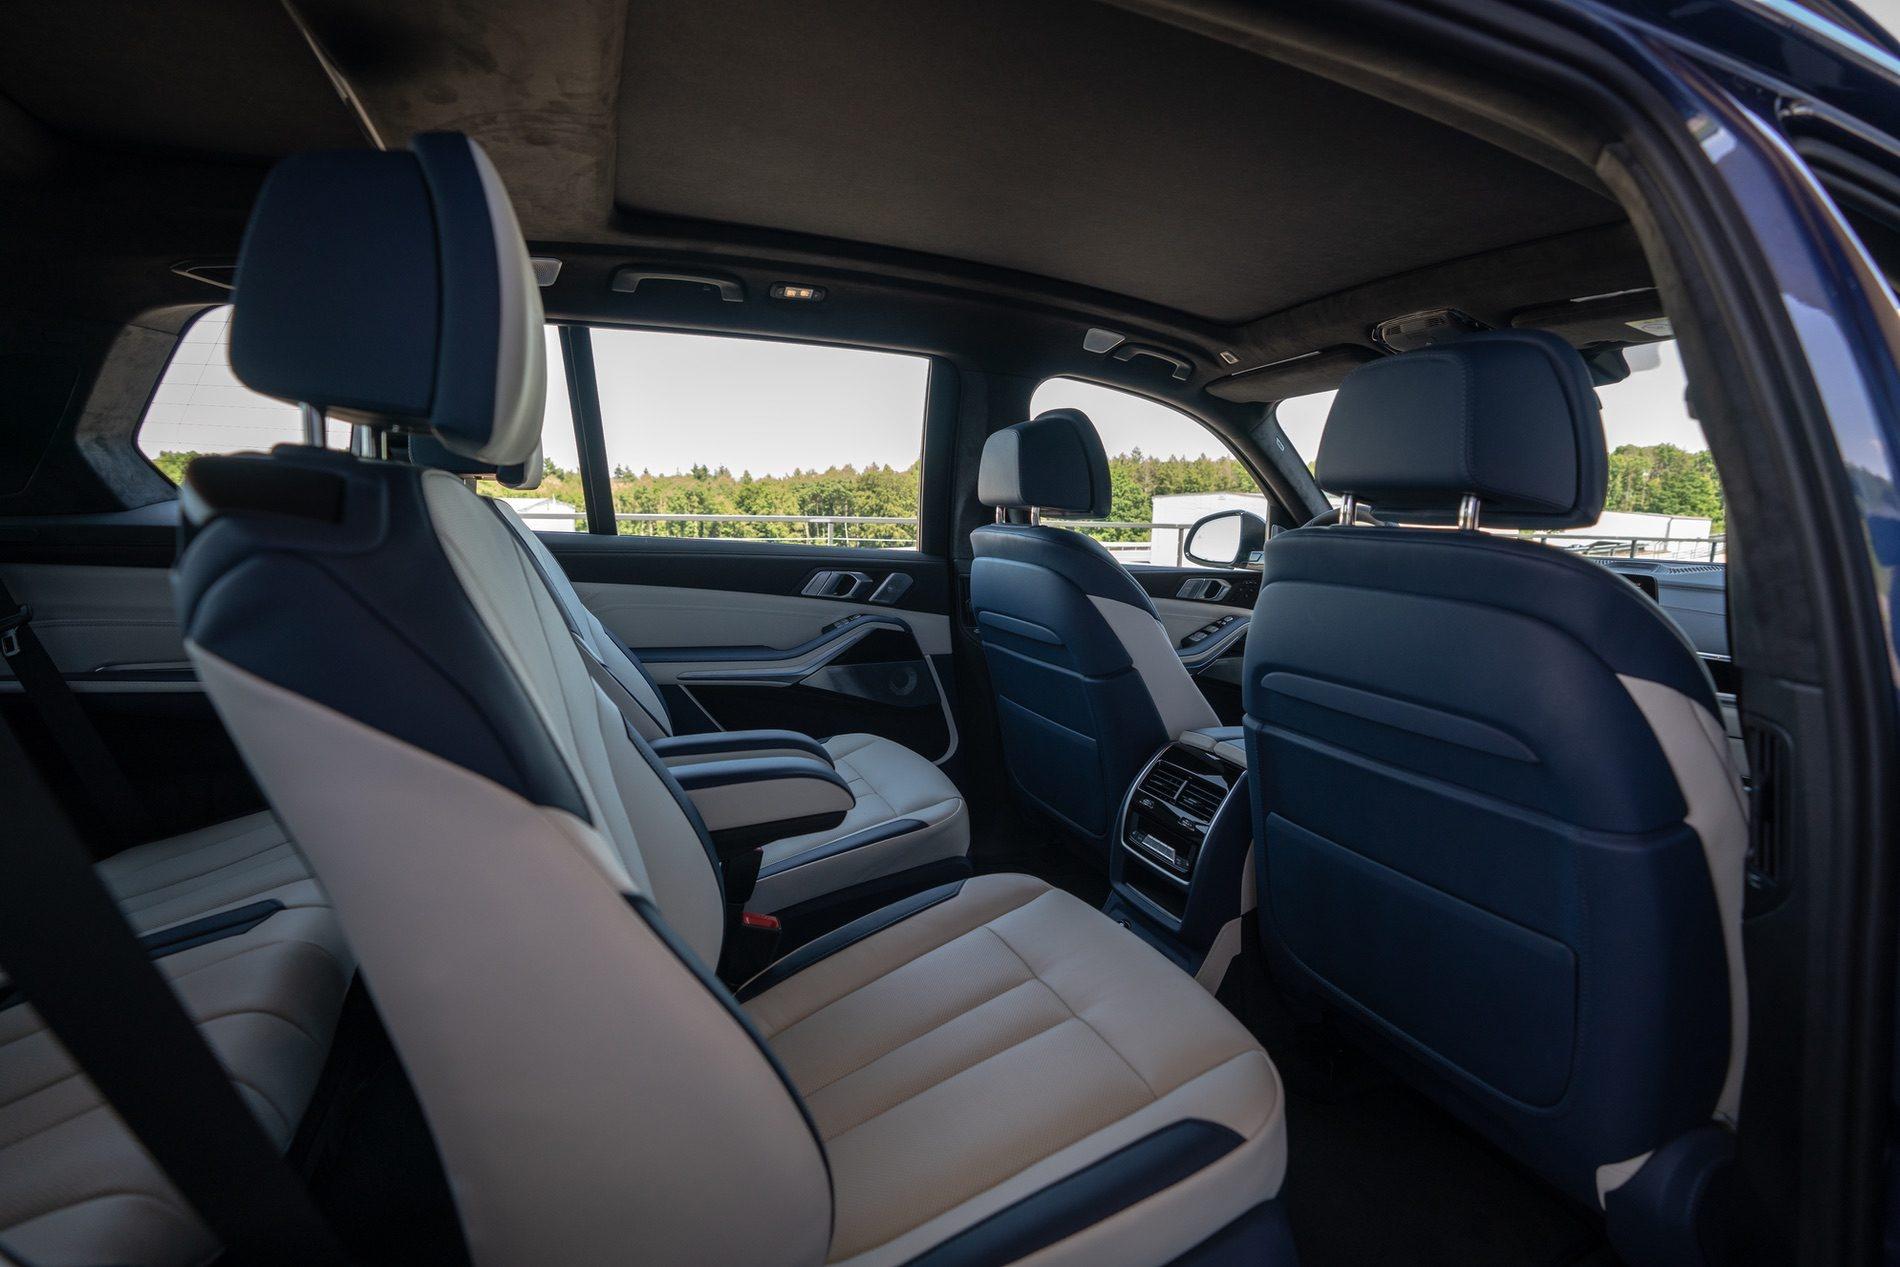 Phien ban BMW X7 hieu nang cao anh 30